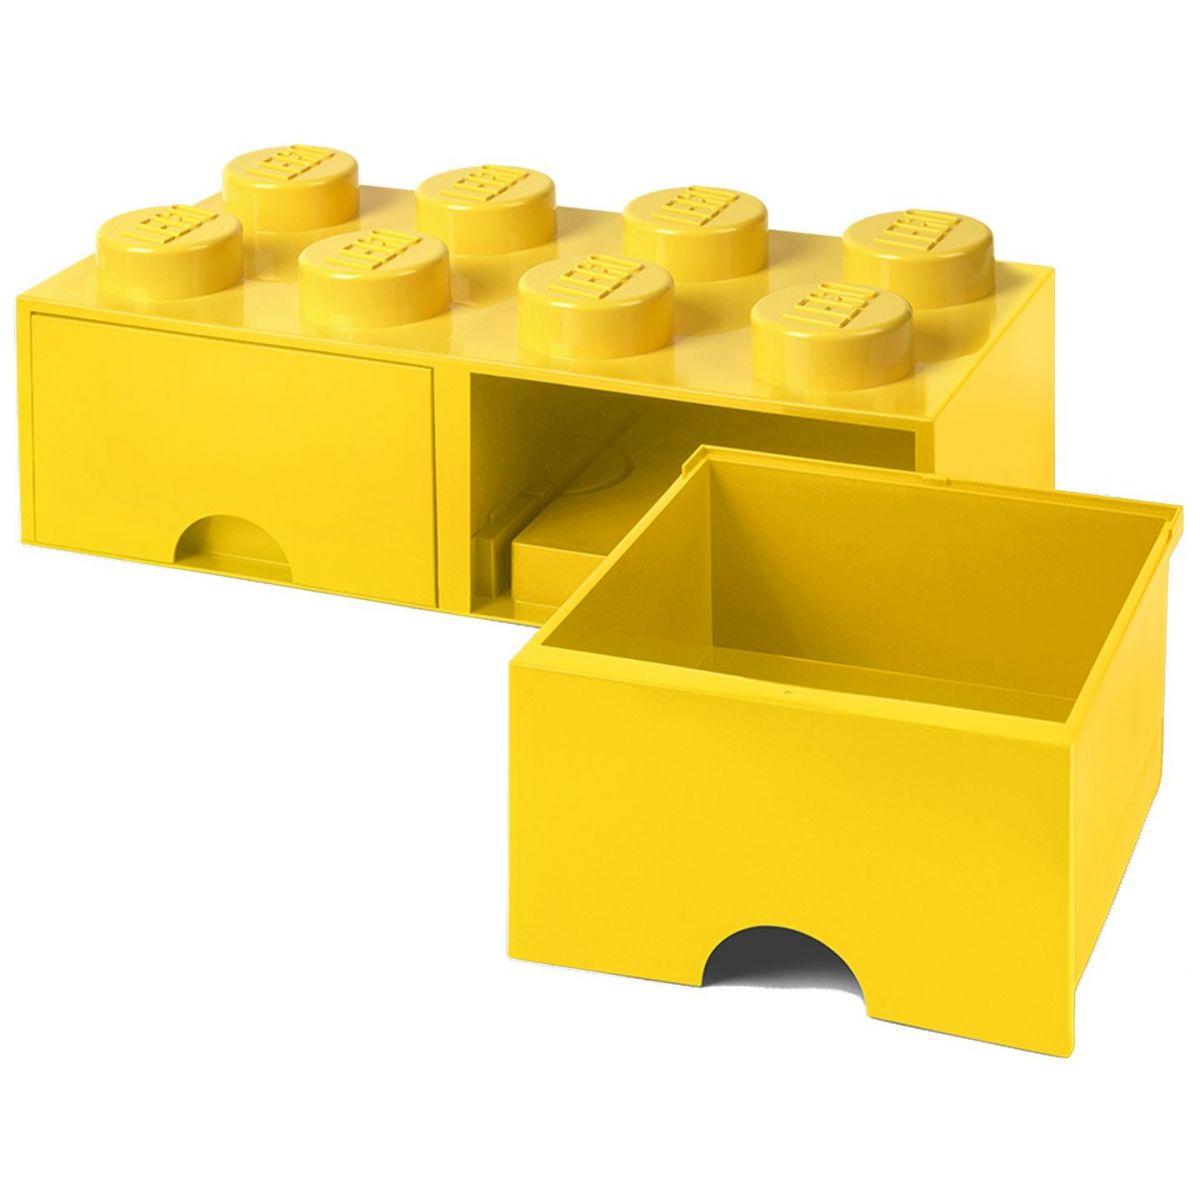 LEGO Úložný box 8 s šuplíky - žlutá - Poškozený obal